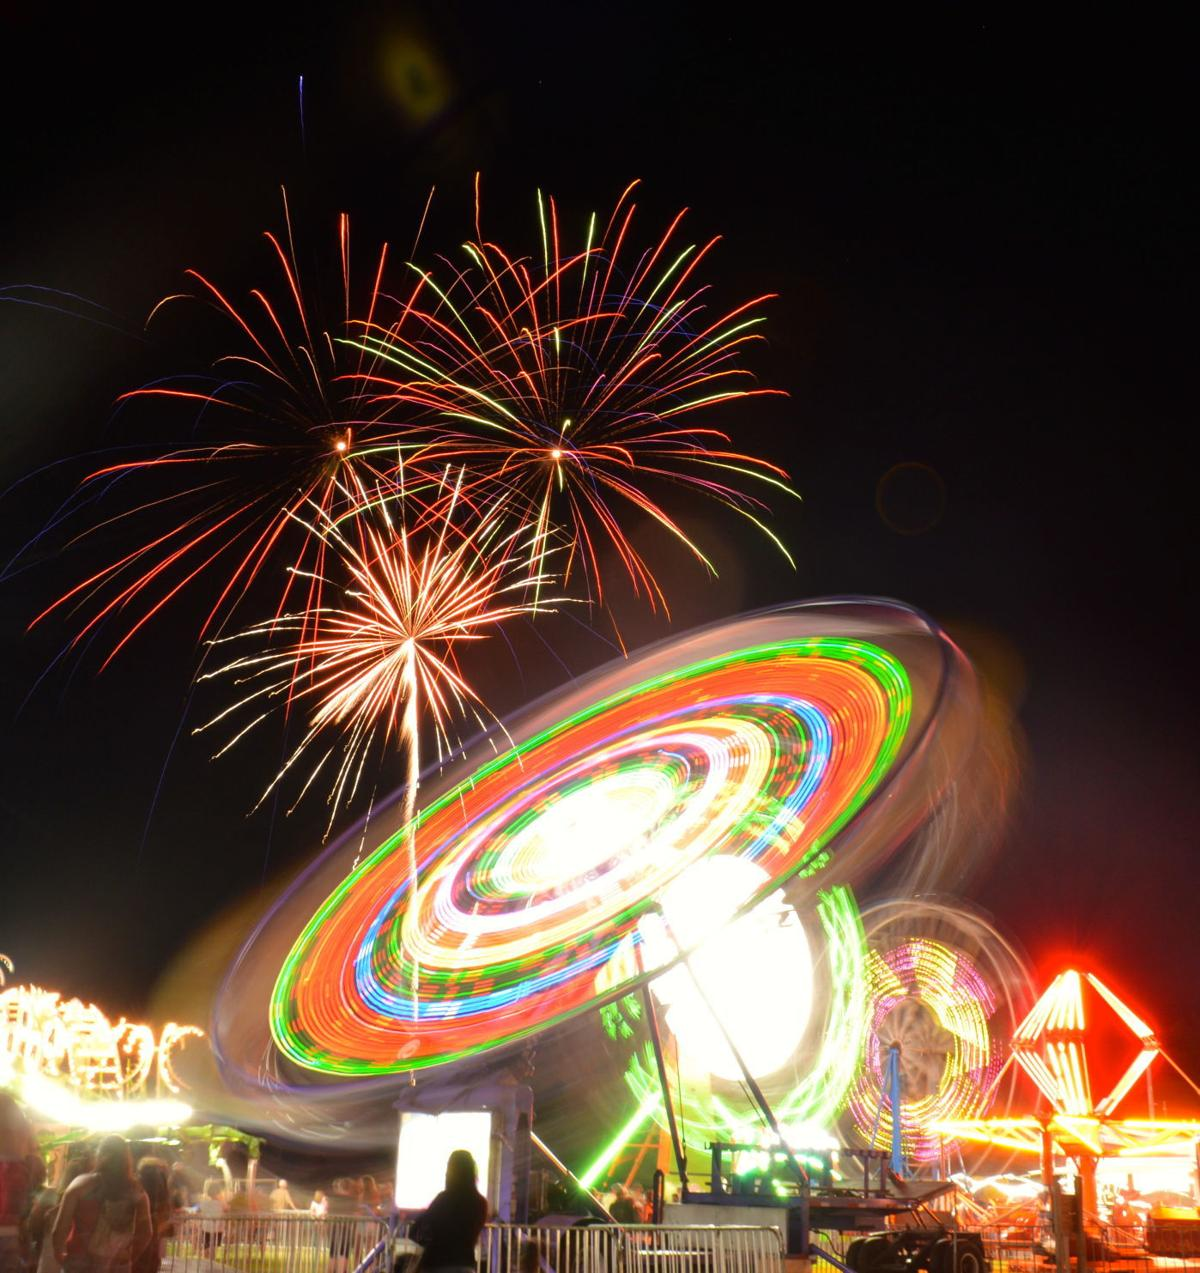 Fireworks over the Greensboro Firemen's Carnival